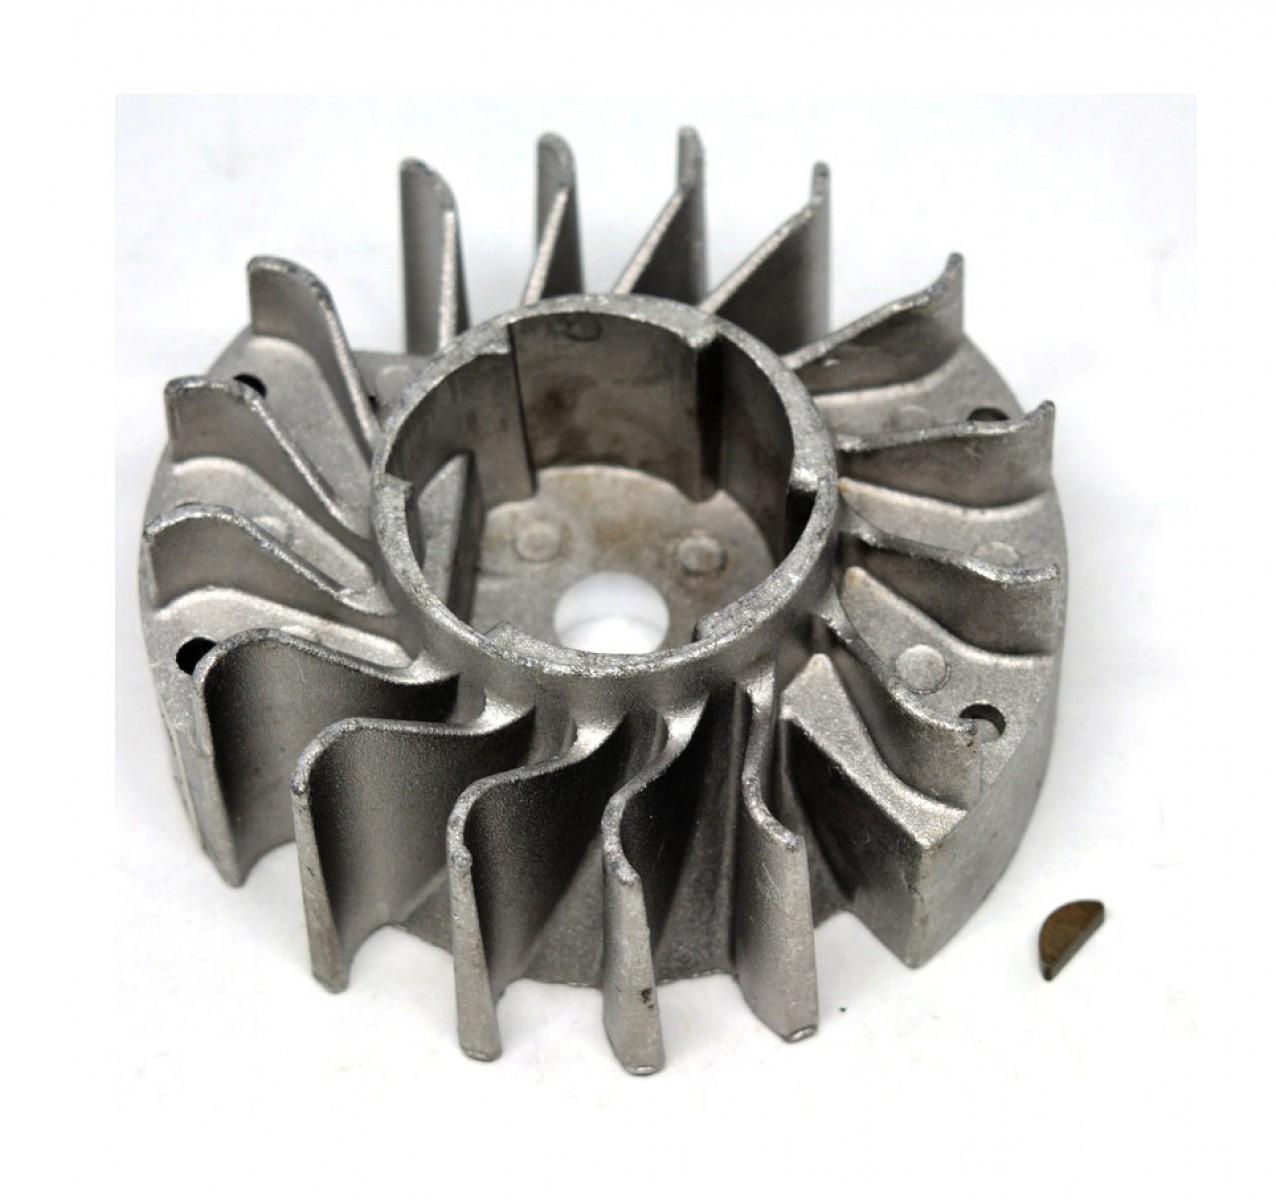 Ventilátor Stihl MS210 MS230 MS250 023 025